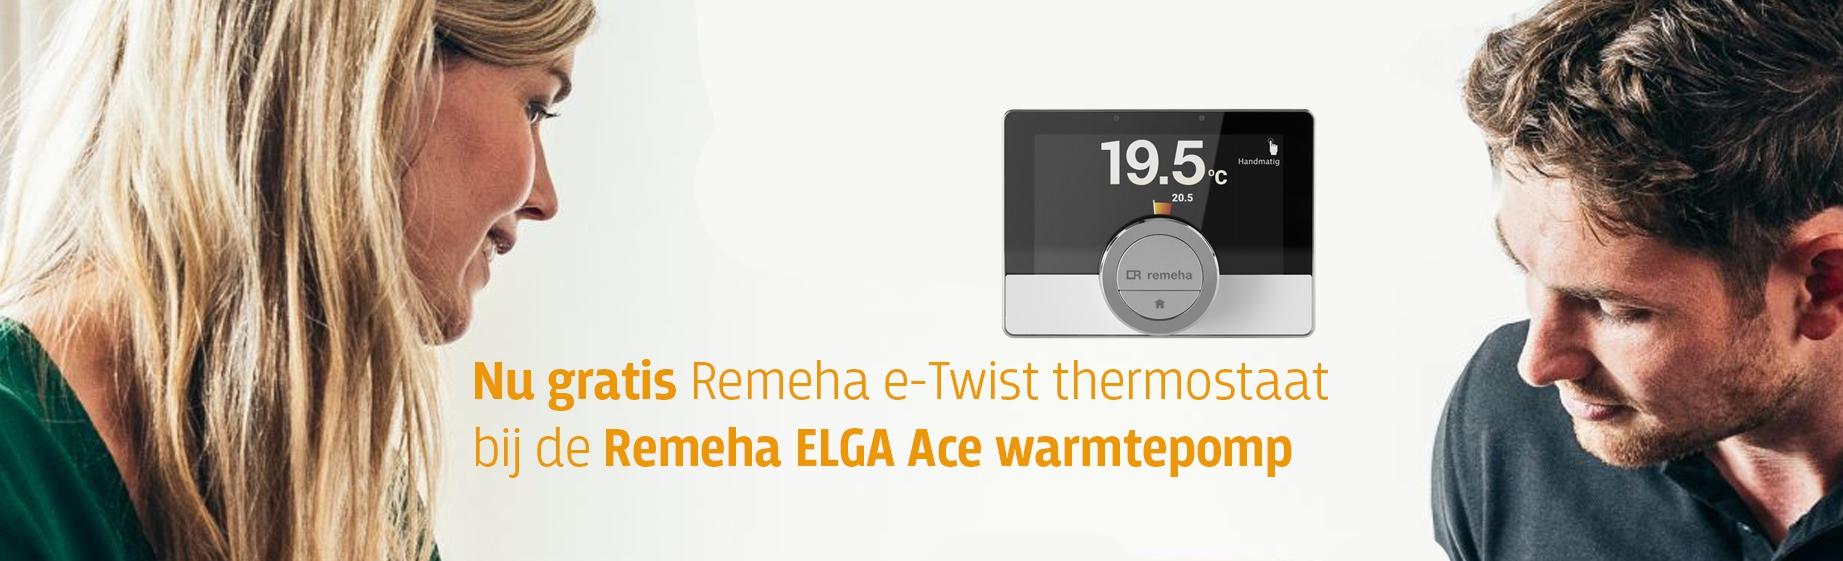 header gratis Remeha e-Twist thermostaat - ELGA